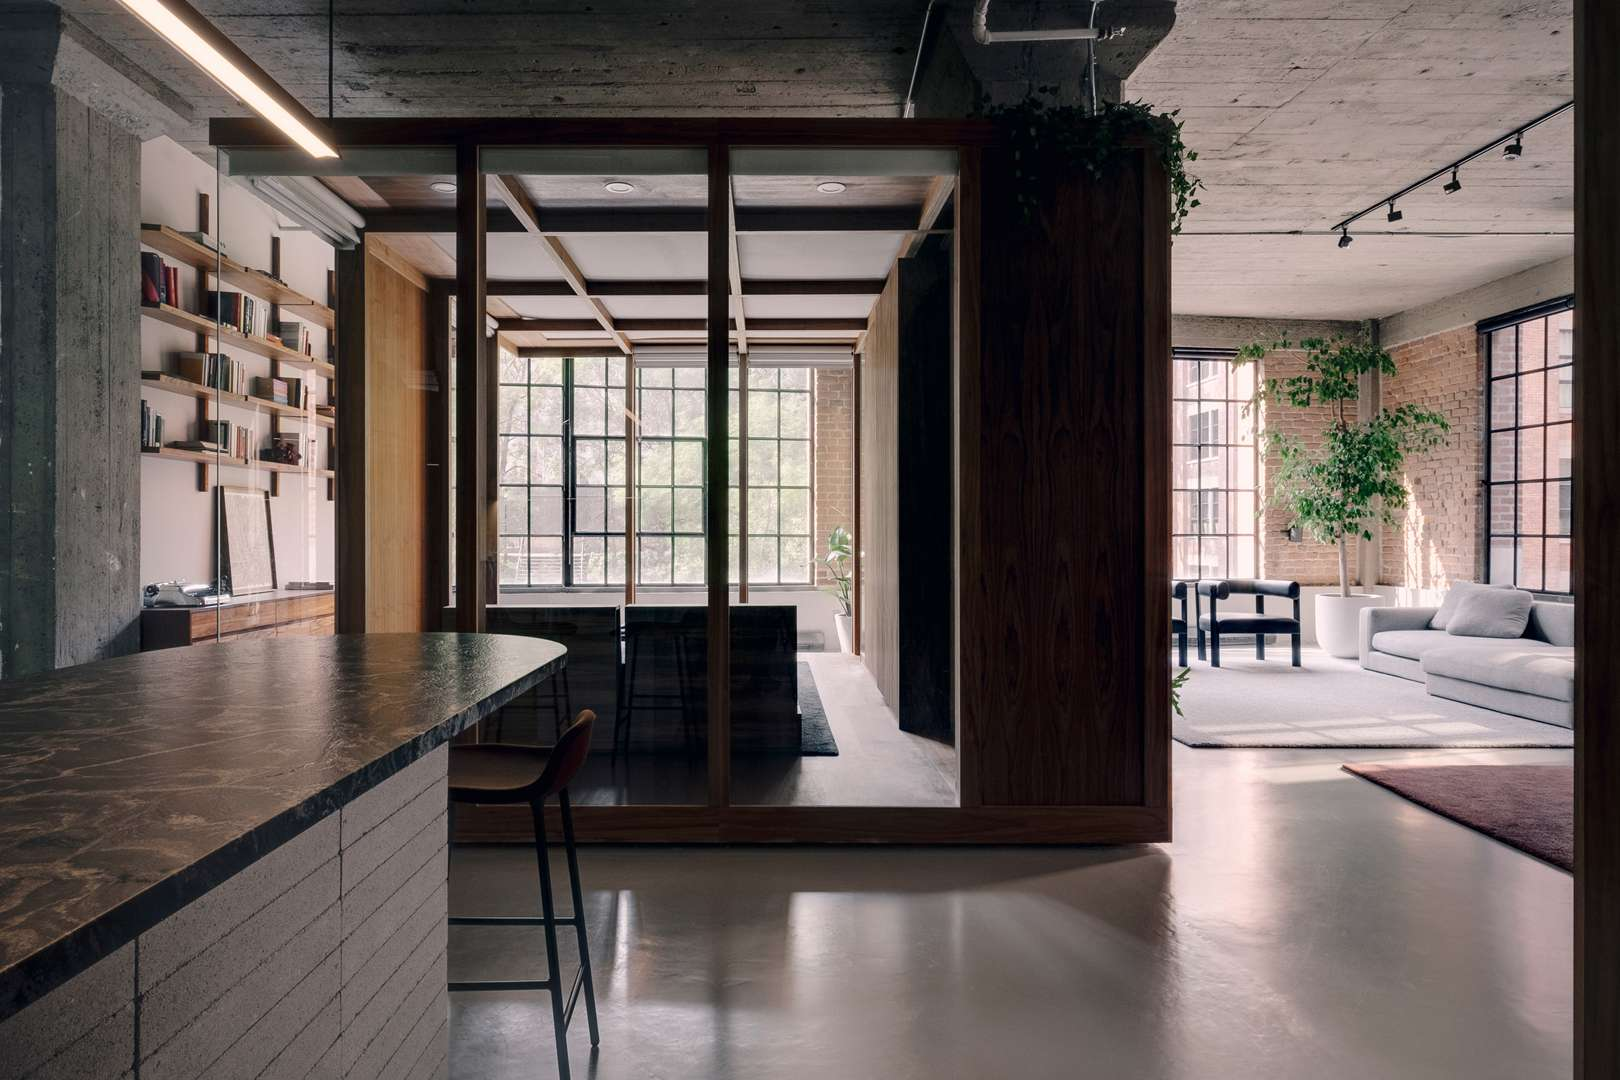 montreal-loft-renovation-by-future-simple-studio-interiors-canada_dezeen_2364_col_15